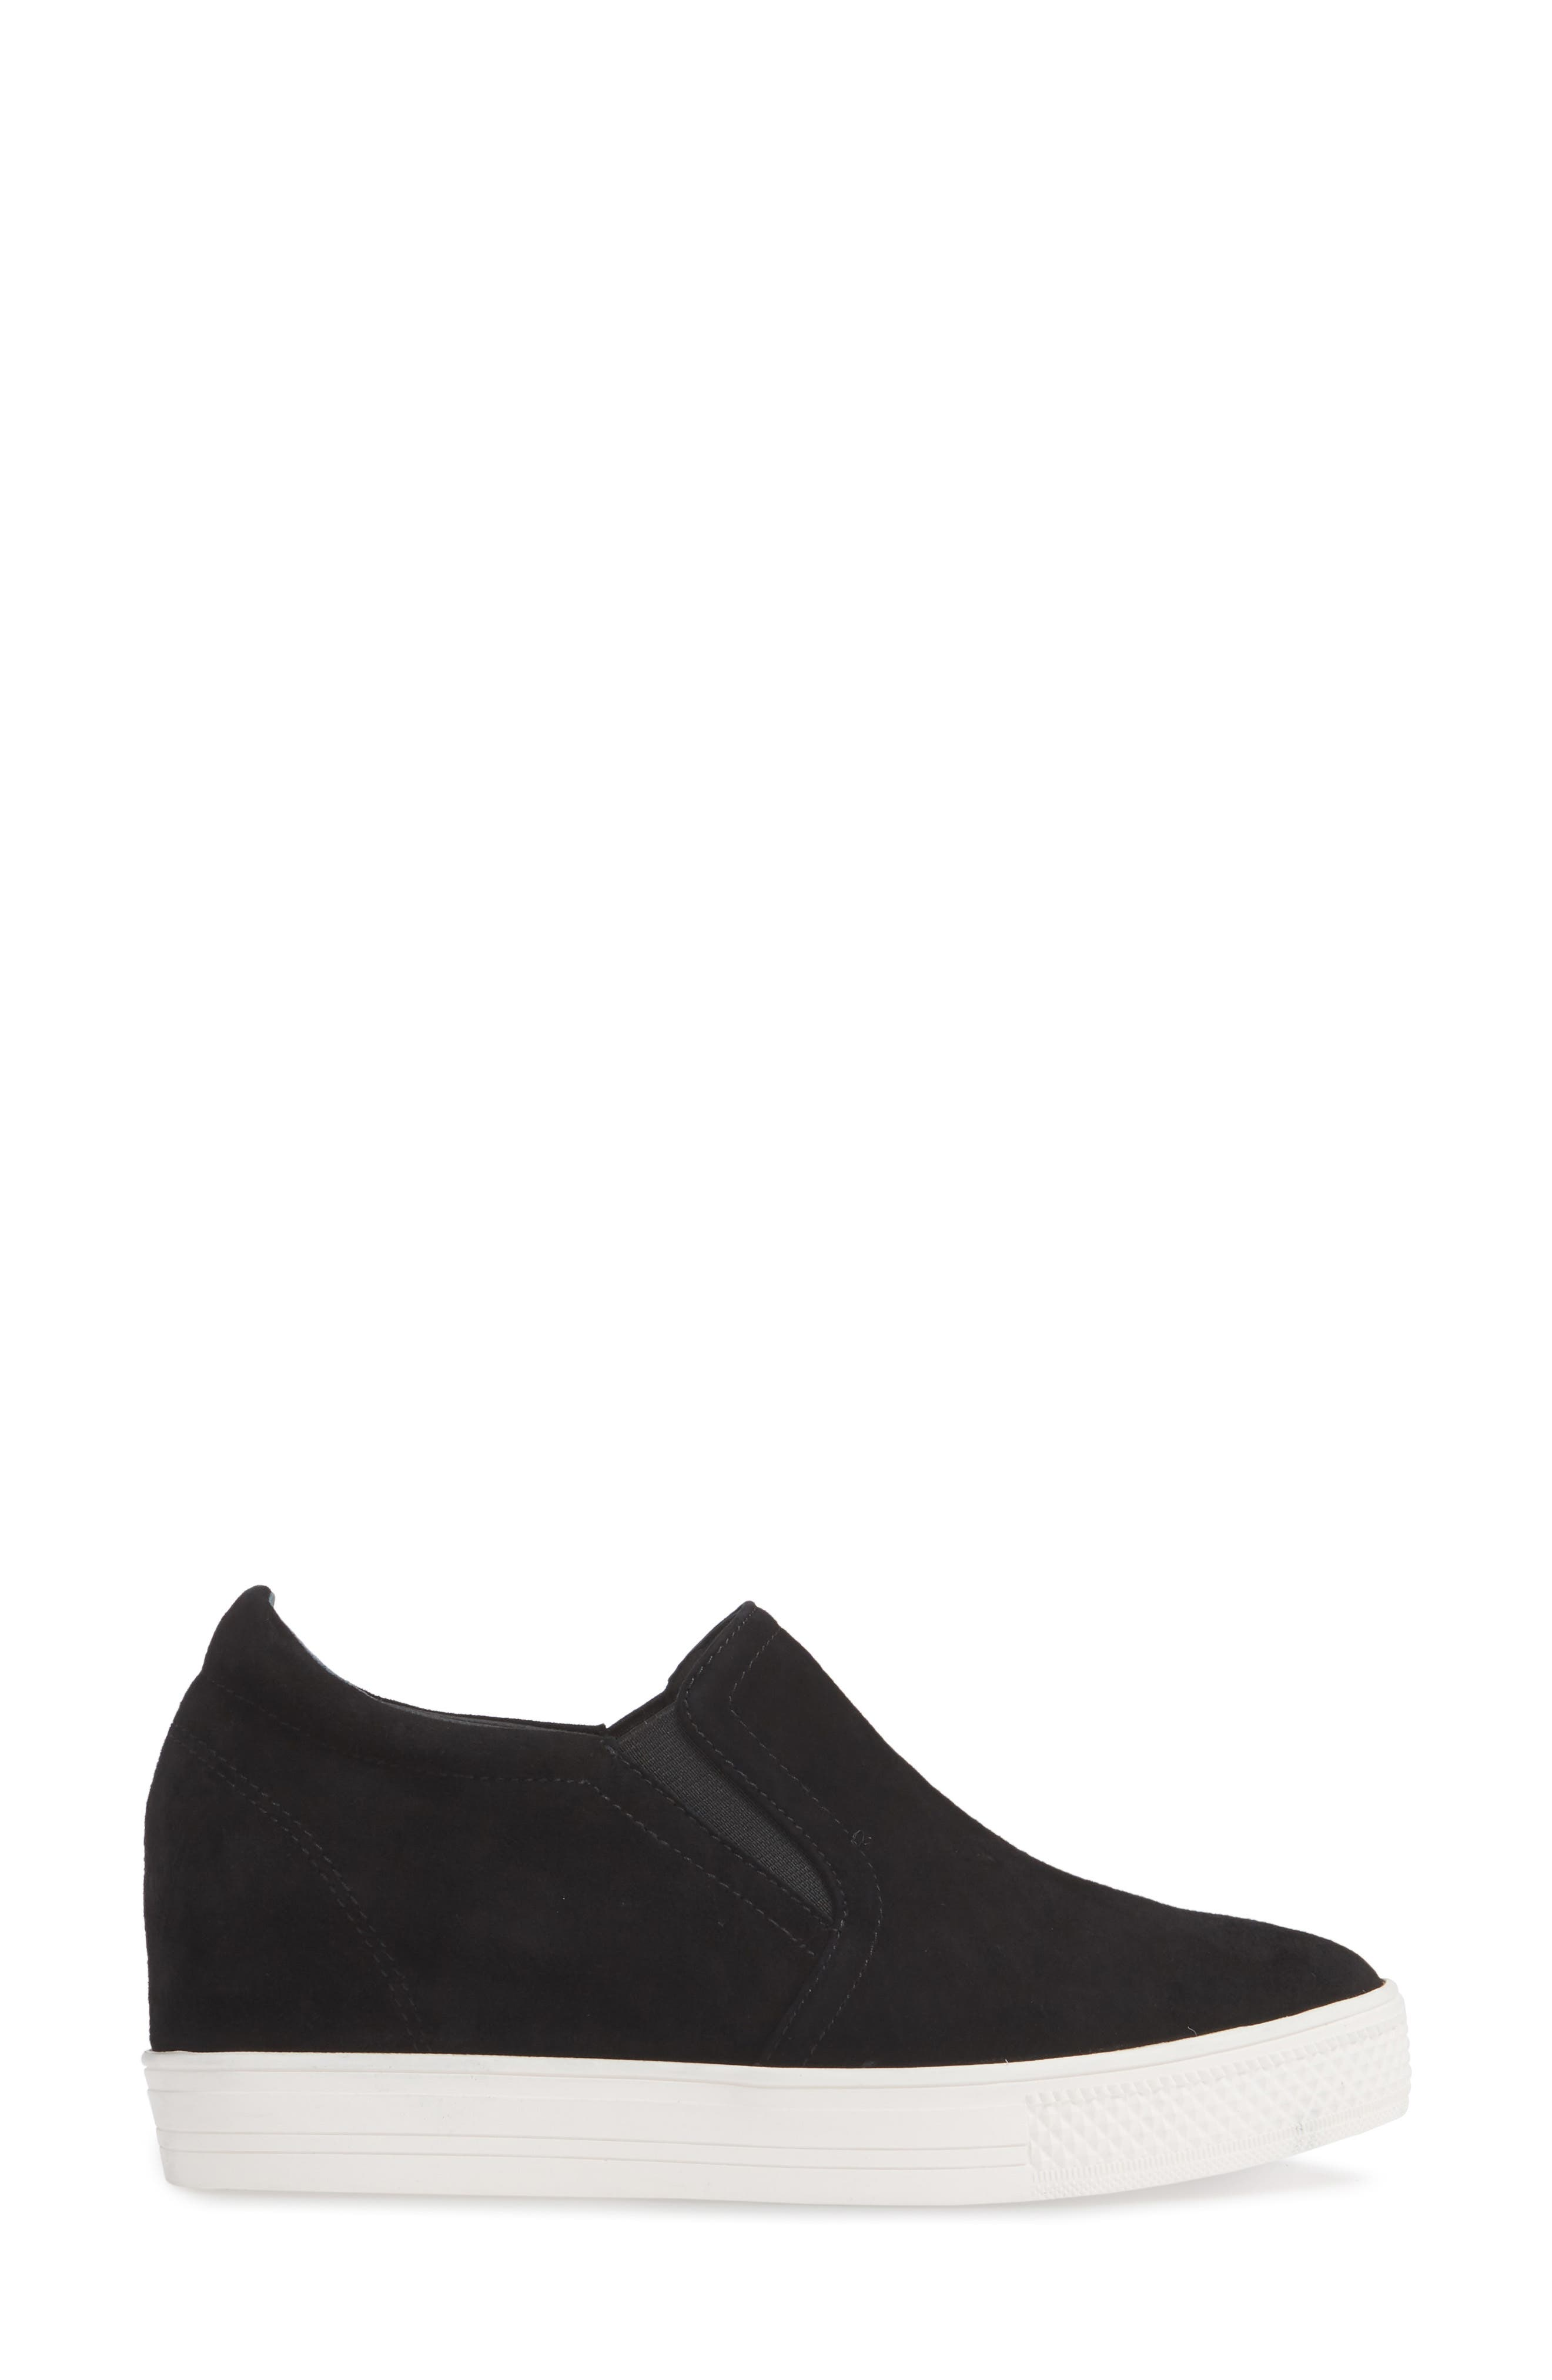 Austin Slip-On Sneaker,                             Alternate thumbnail 3, color,                             BLACK SUEDE